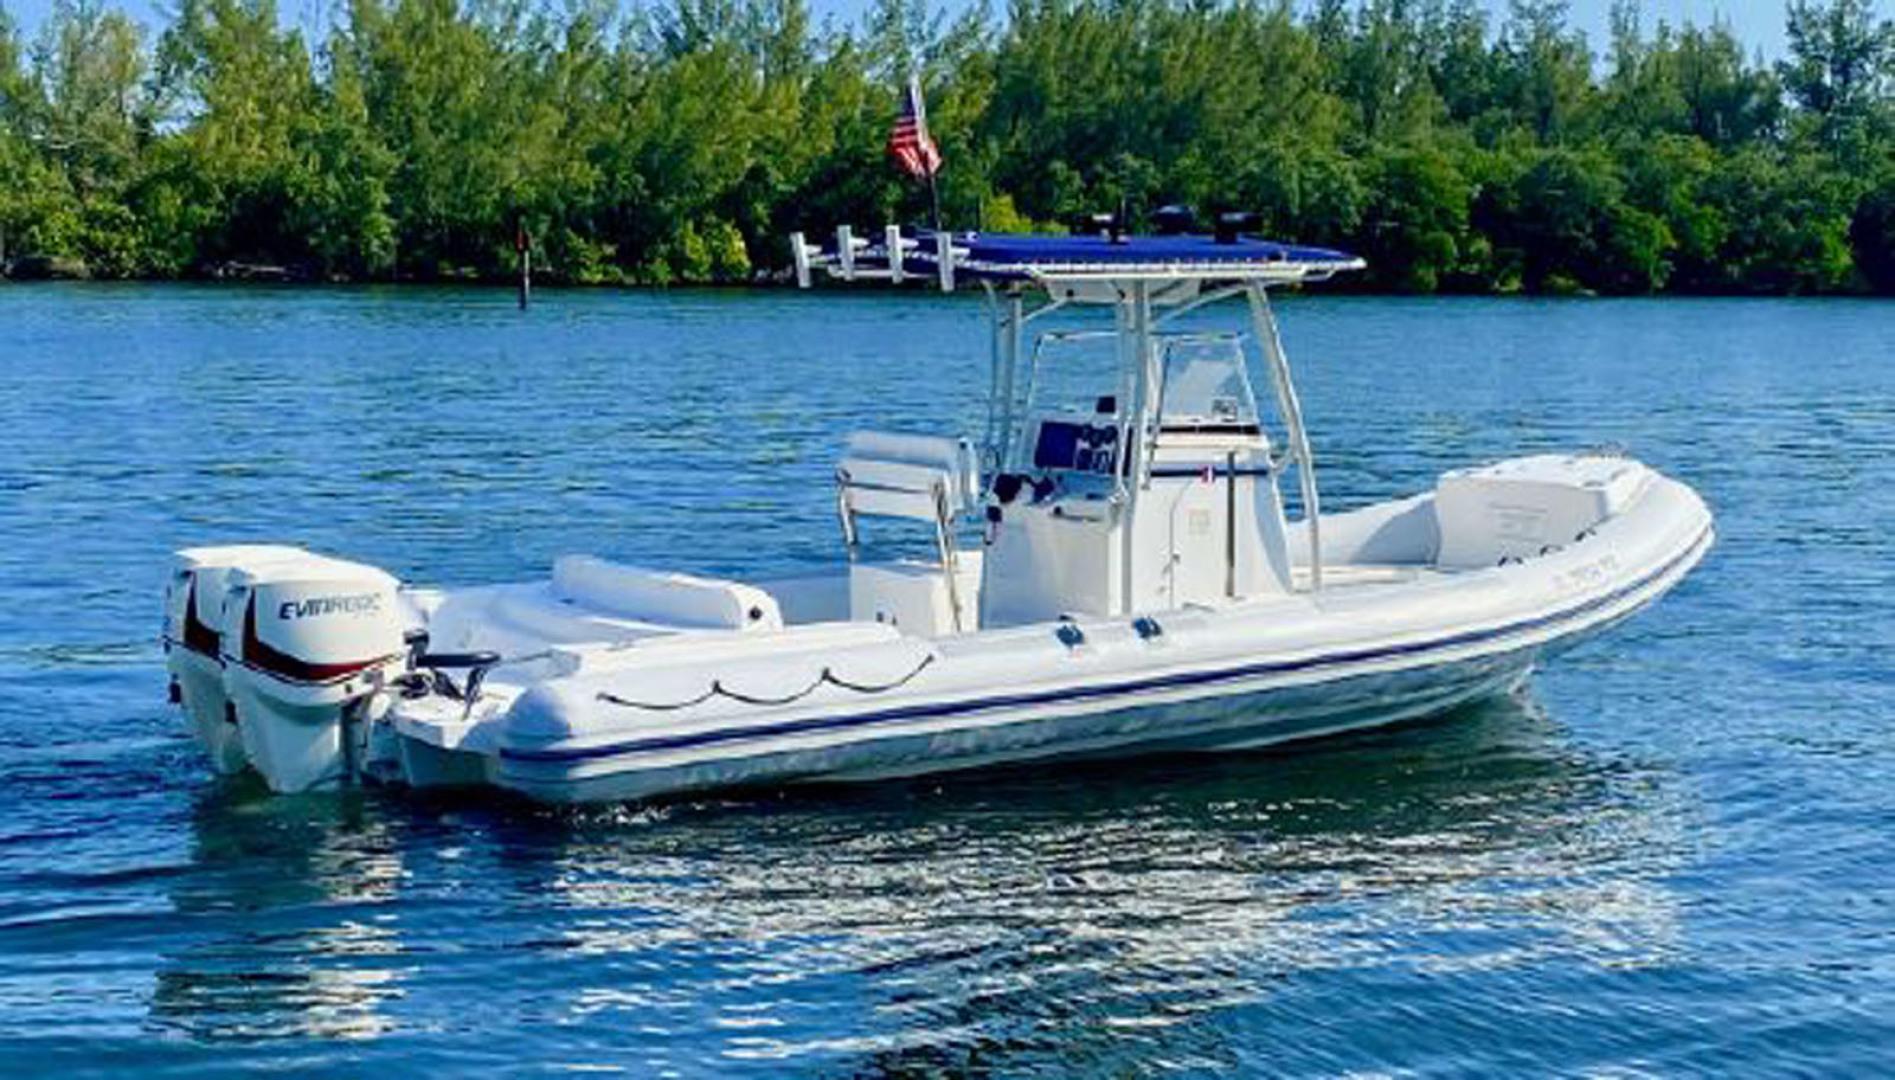 Flexboat-SR760LL 2014-No Name Boca Raton-Florida-United States-1555822 | Thumbnail